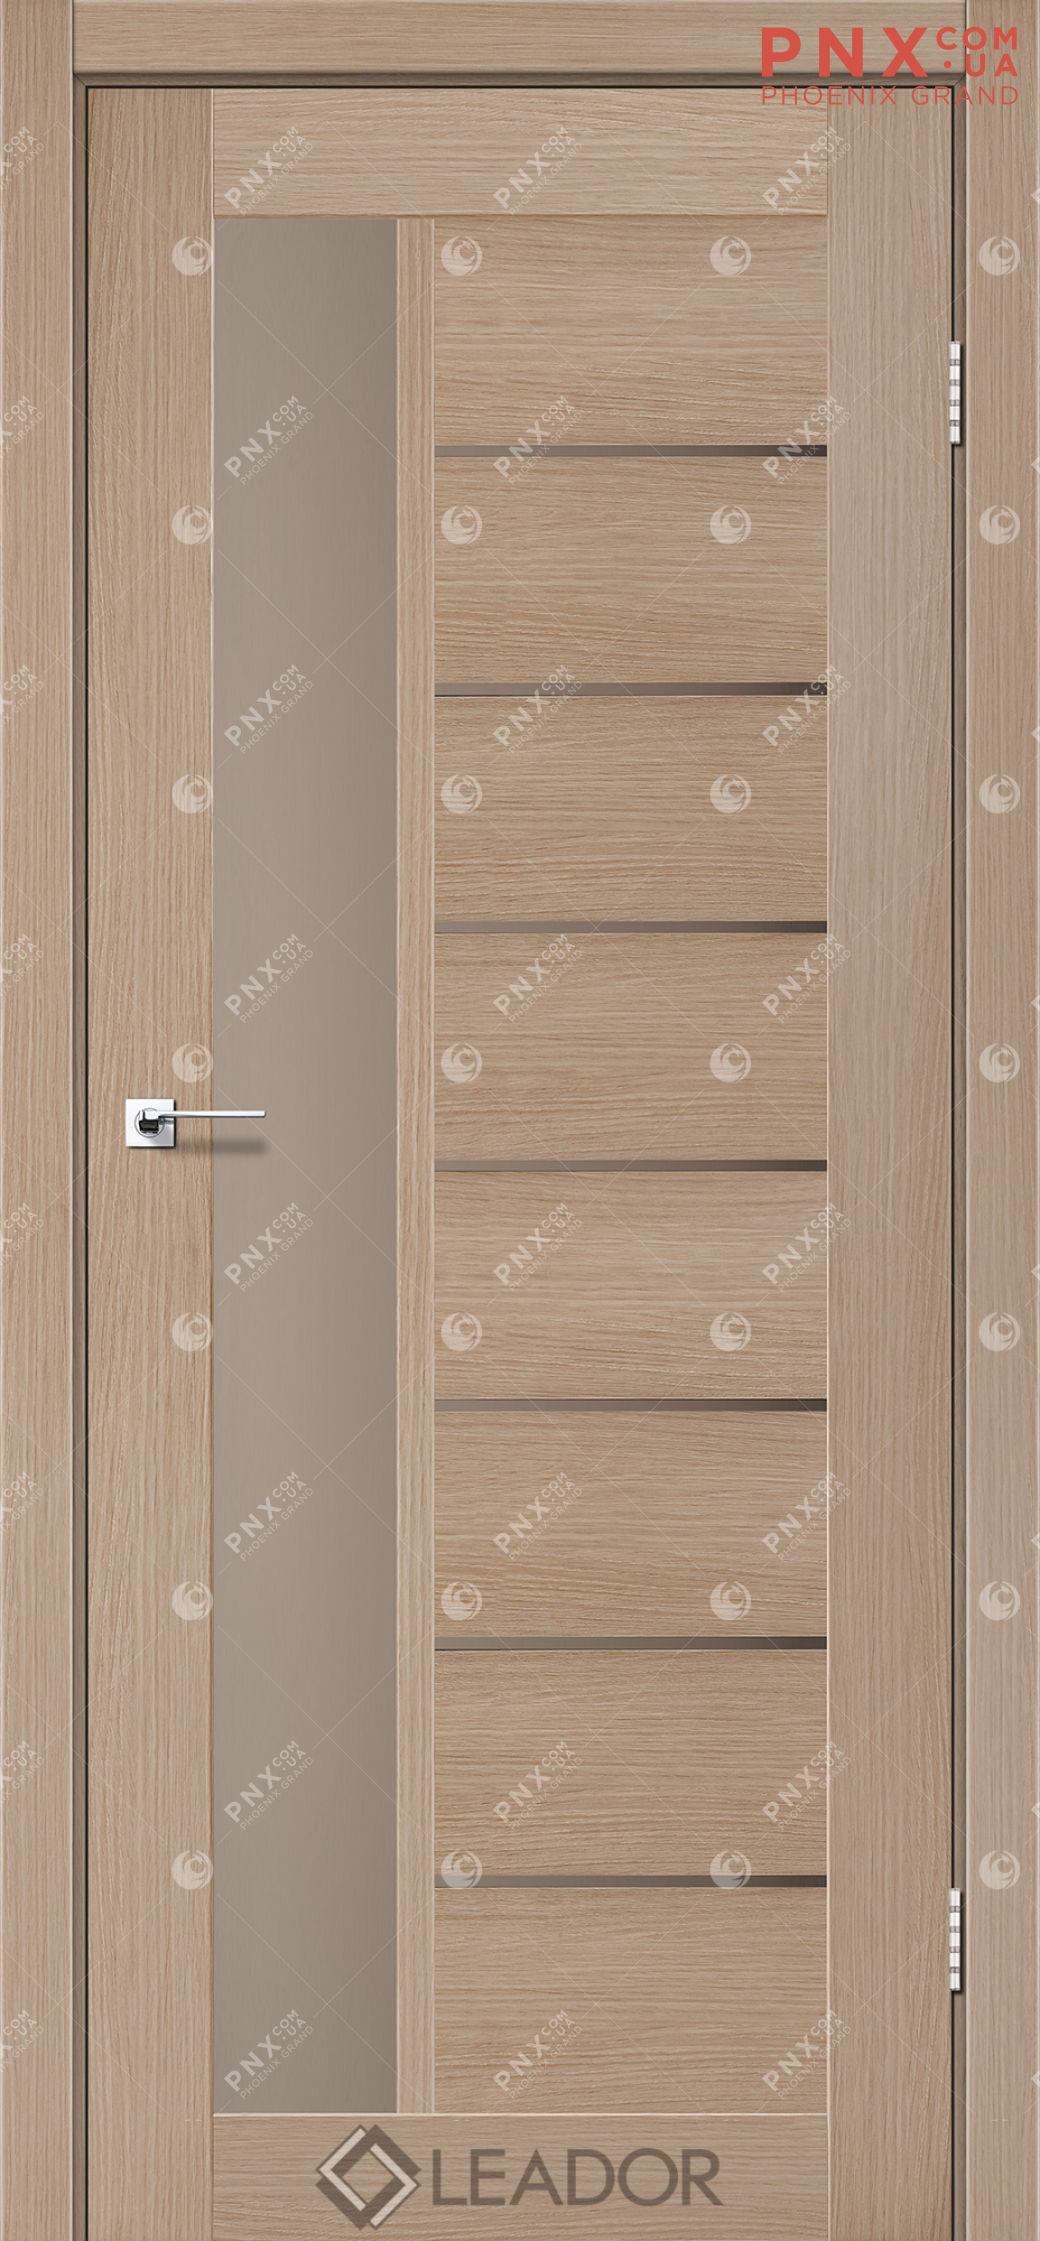 Межкомнатная дверь LEADOR Lorenza, Дуб Мокко, Стекло сатин бронза